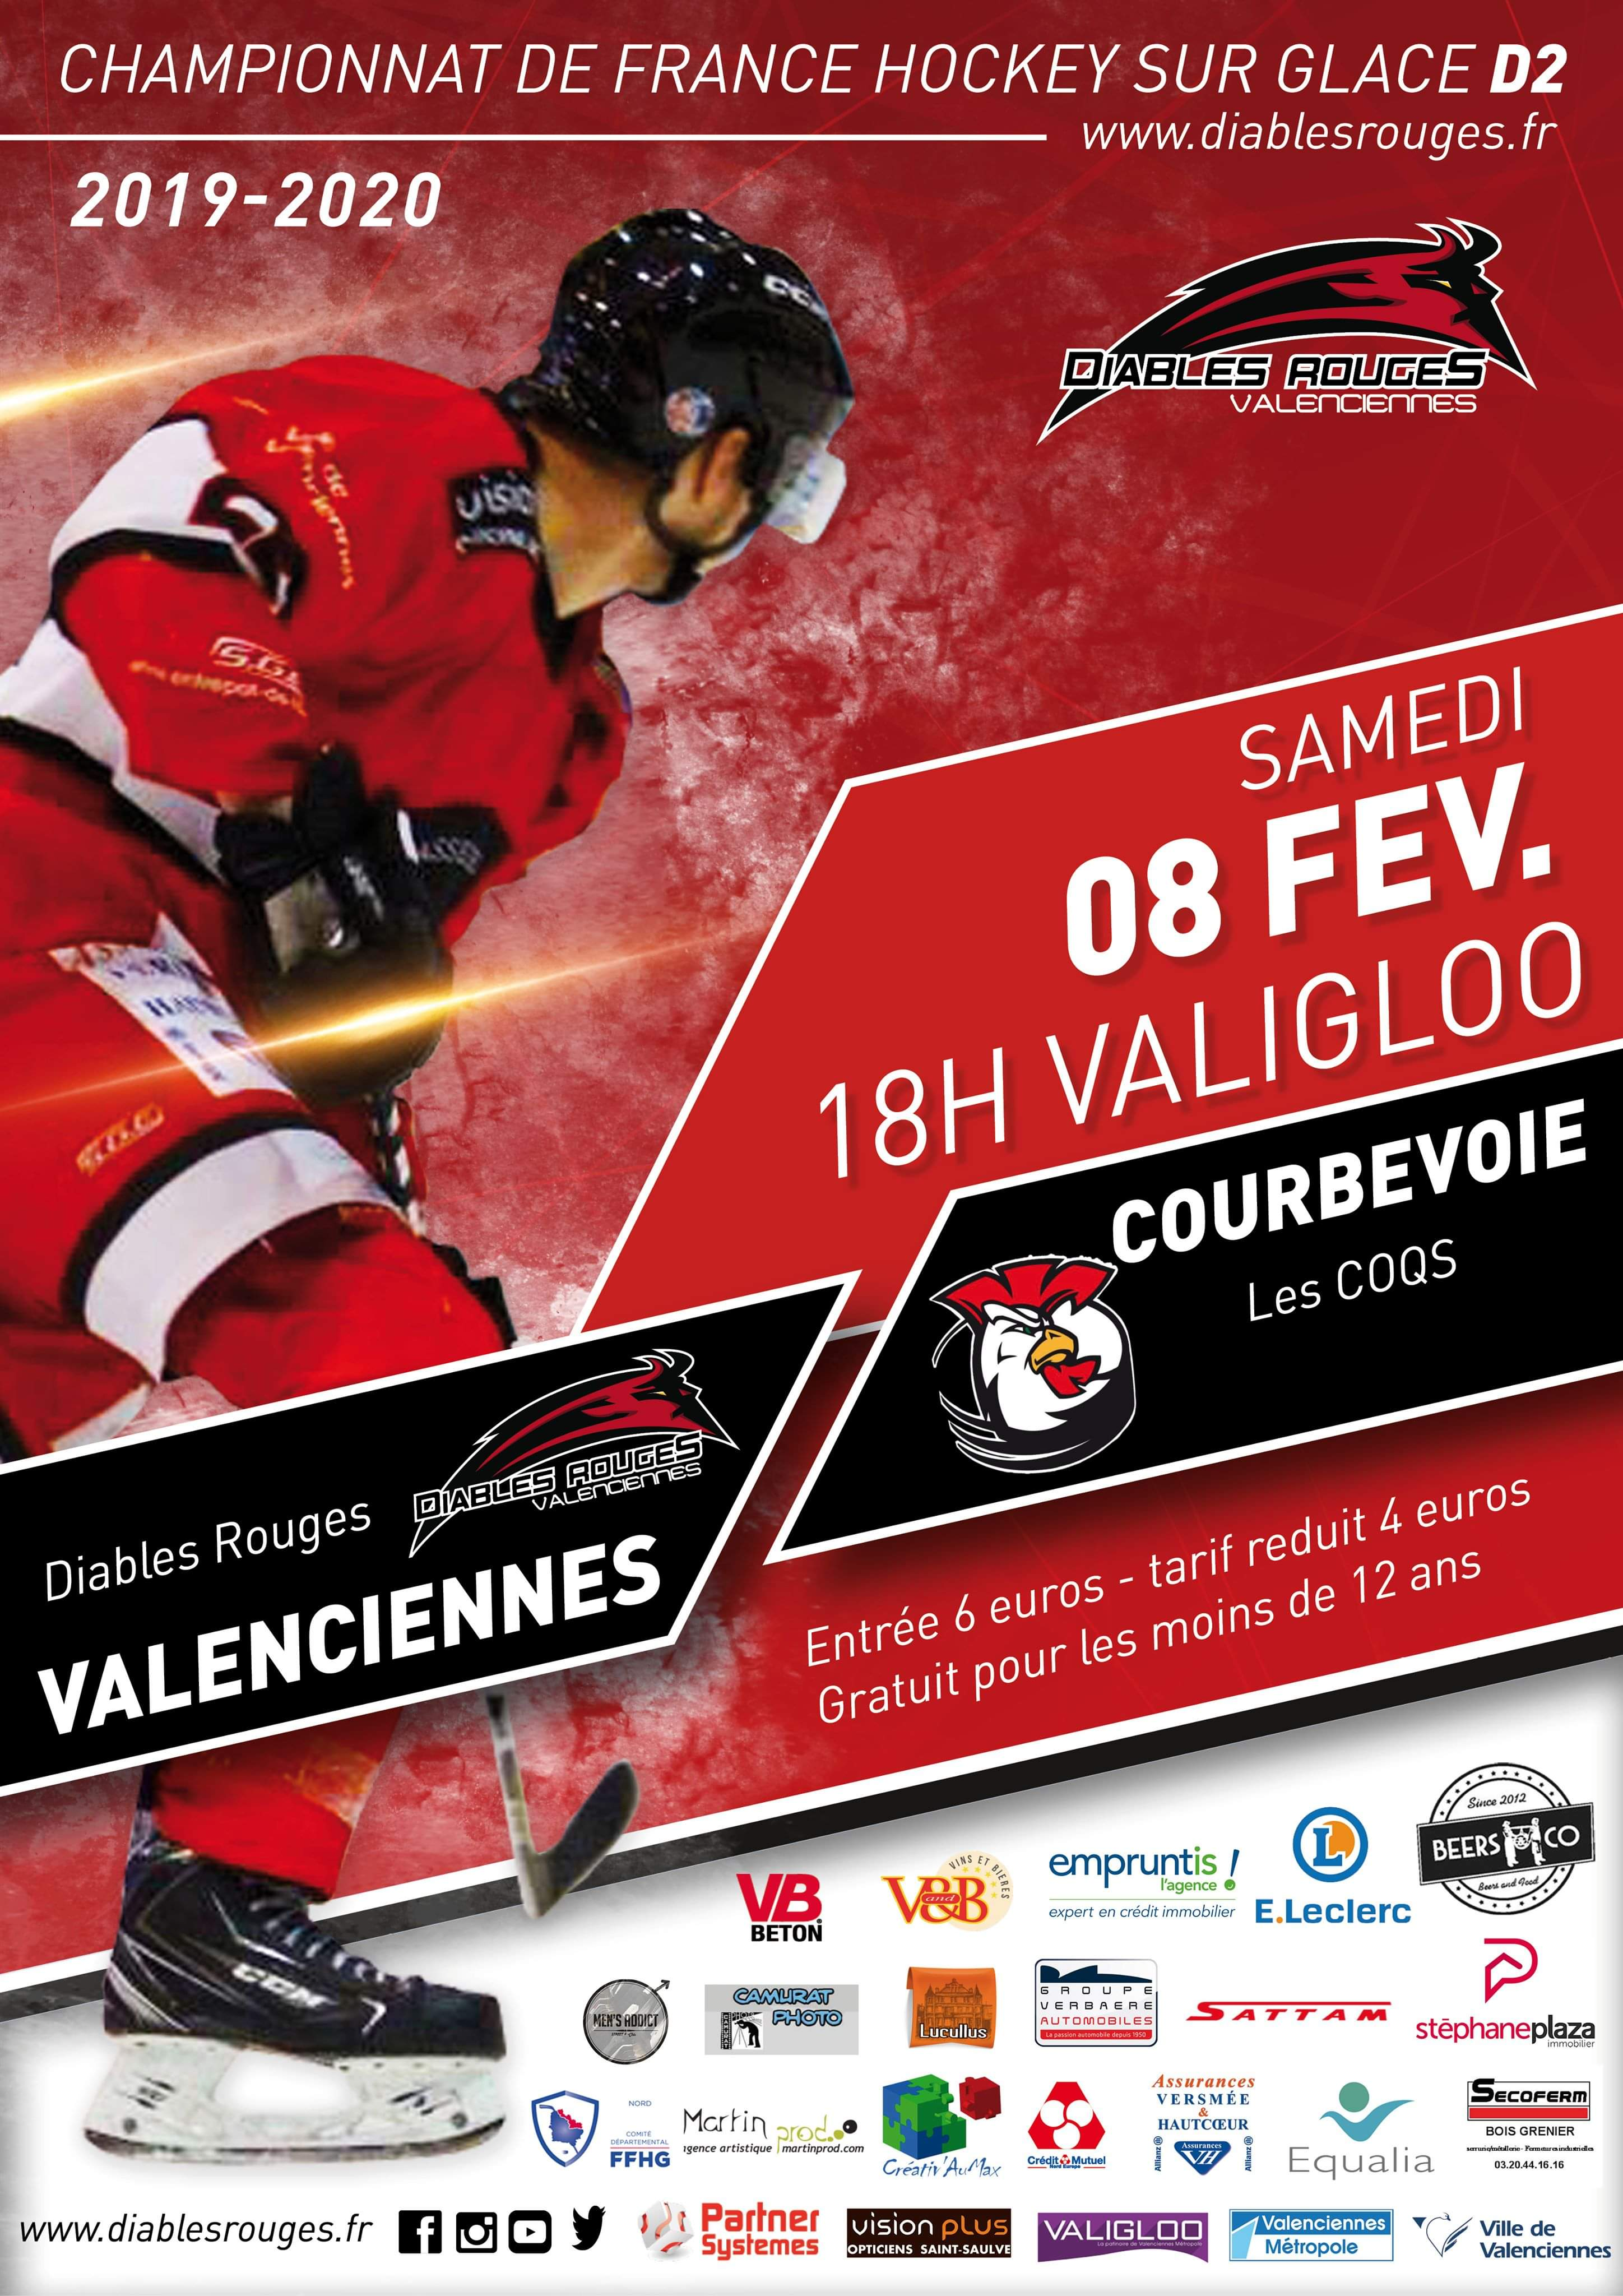 Valenciennes reçoit Courbevoie ce samedi 08 février 2020